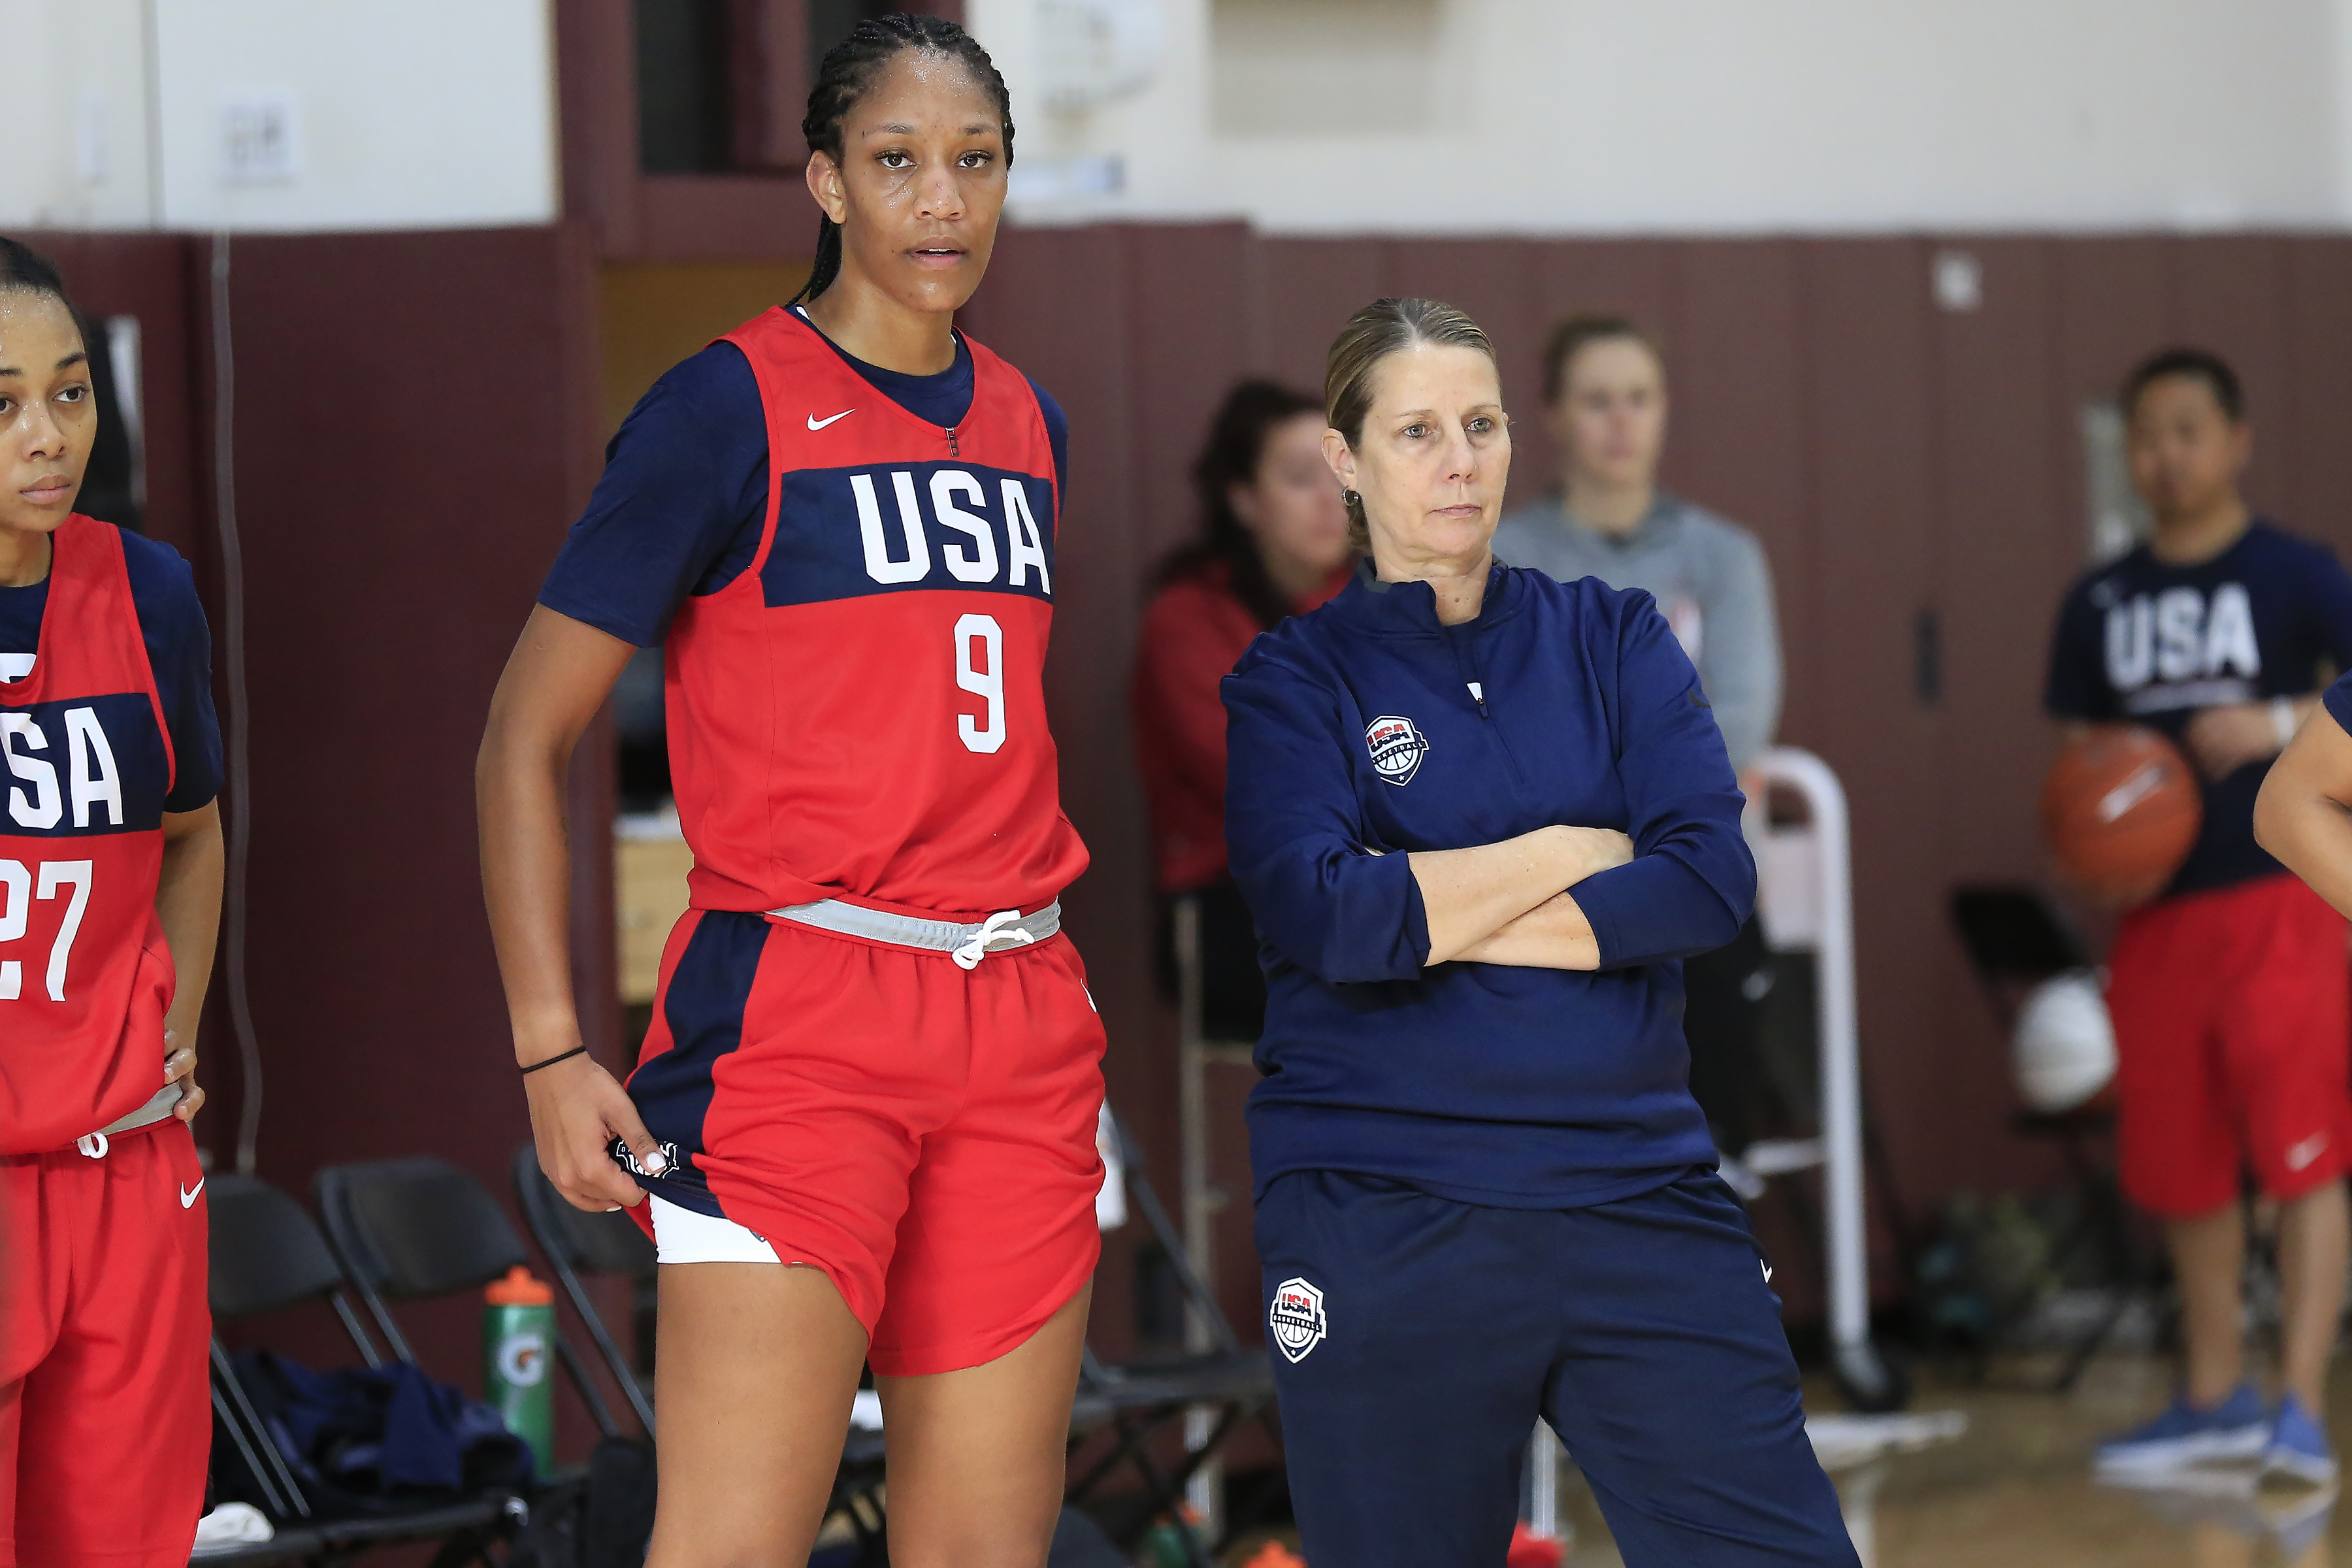 2019 USA Women's National Team Practice